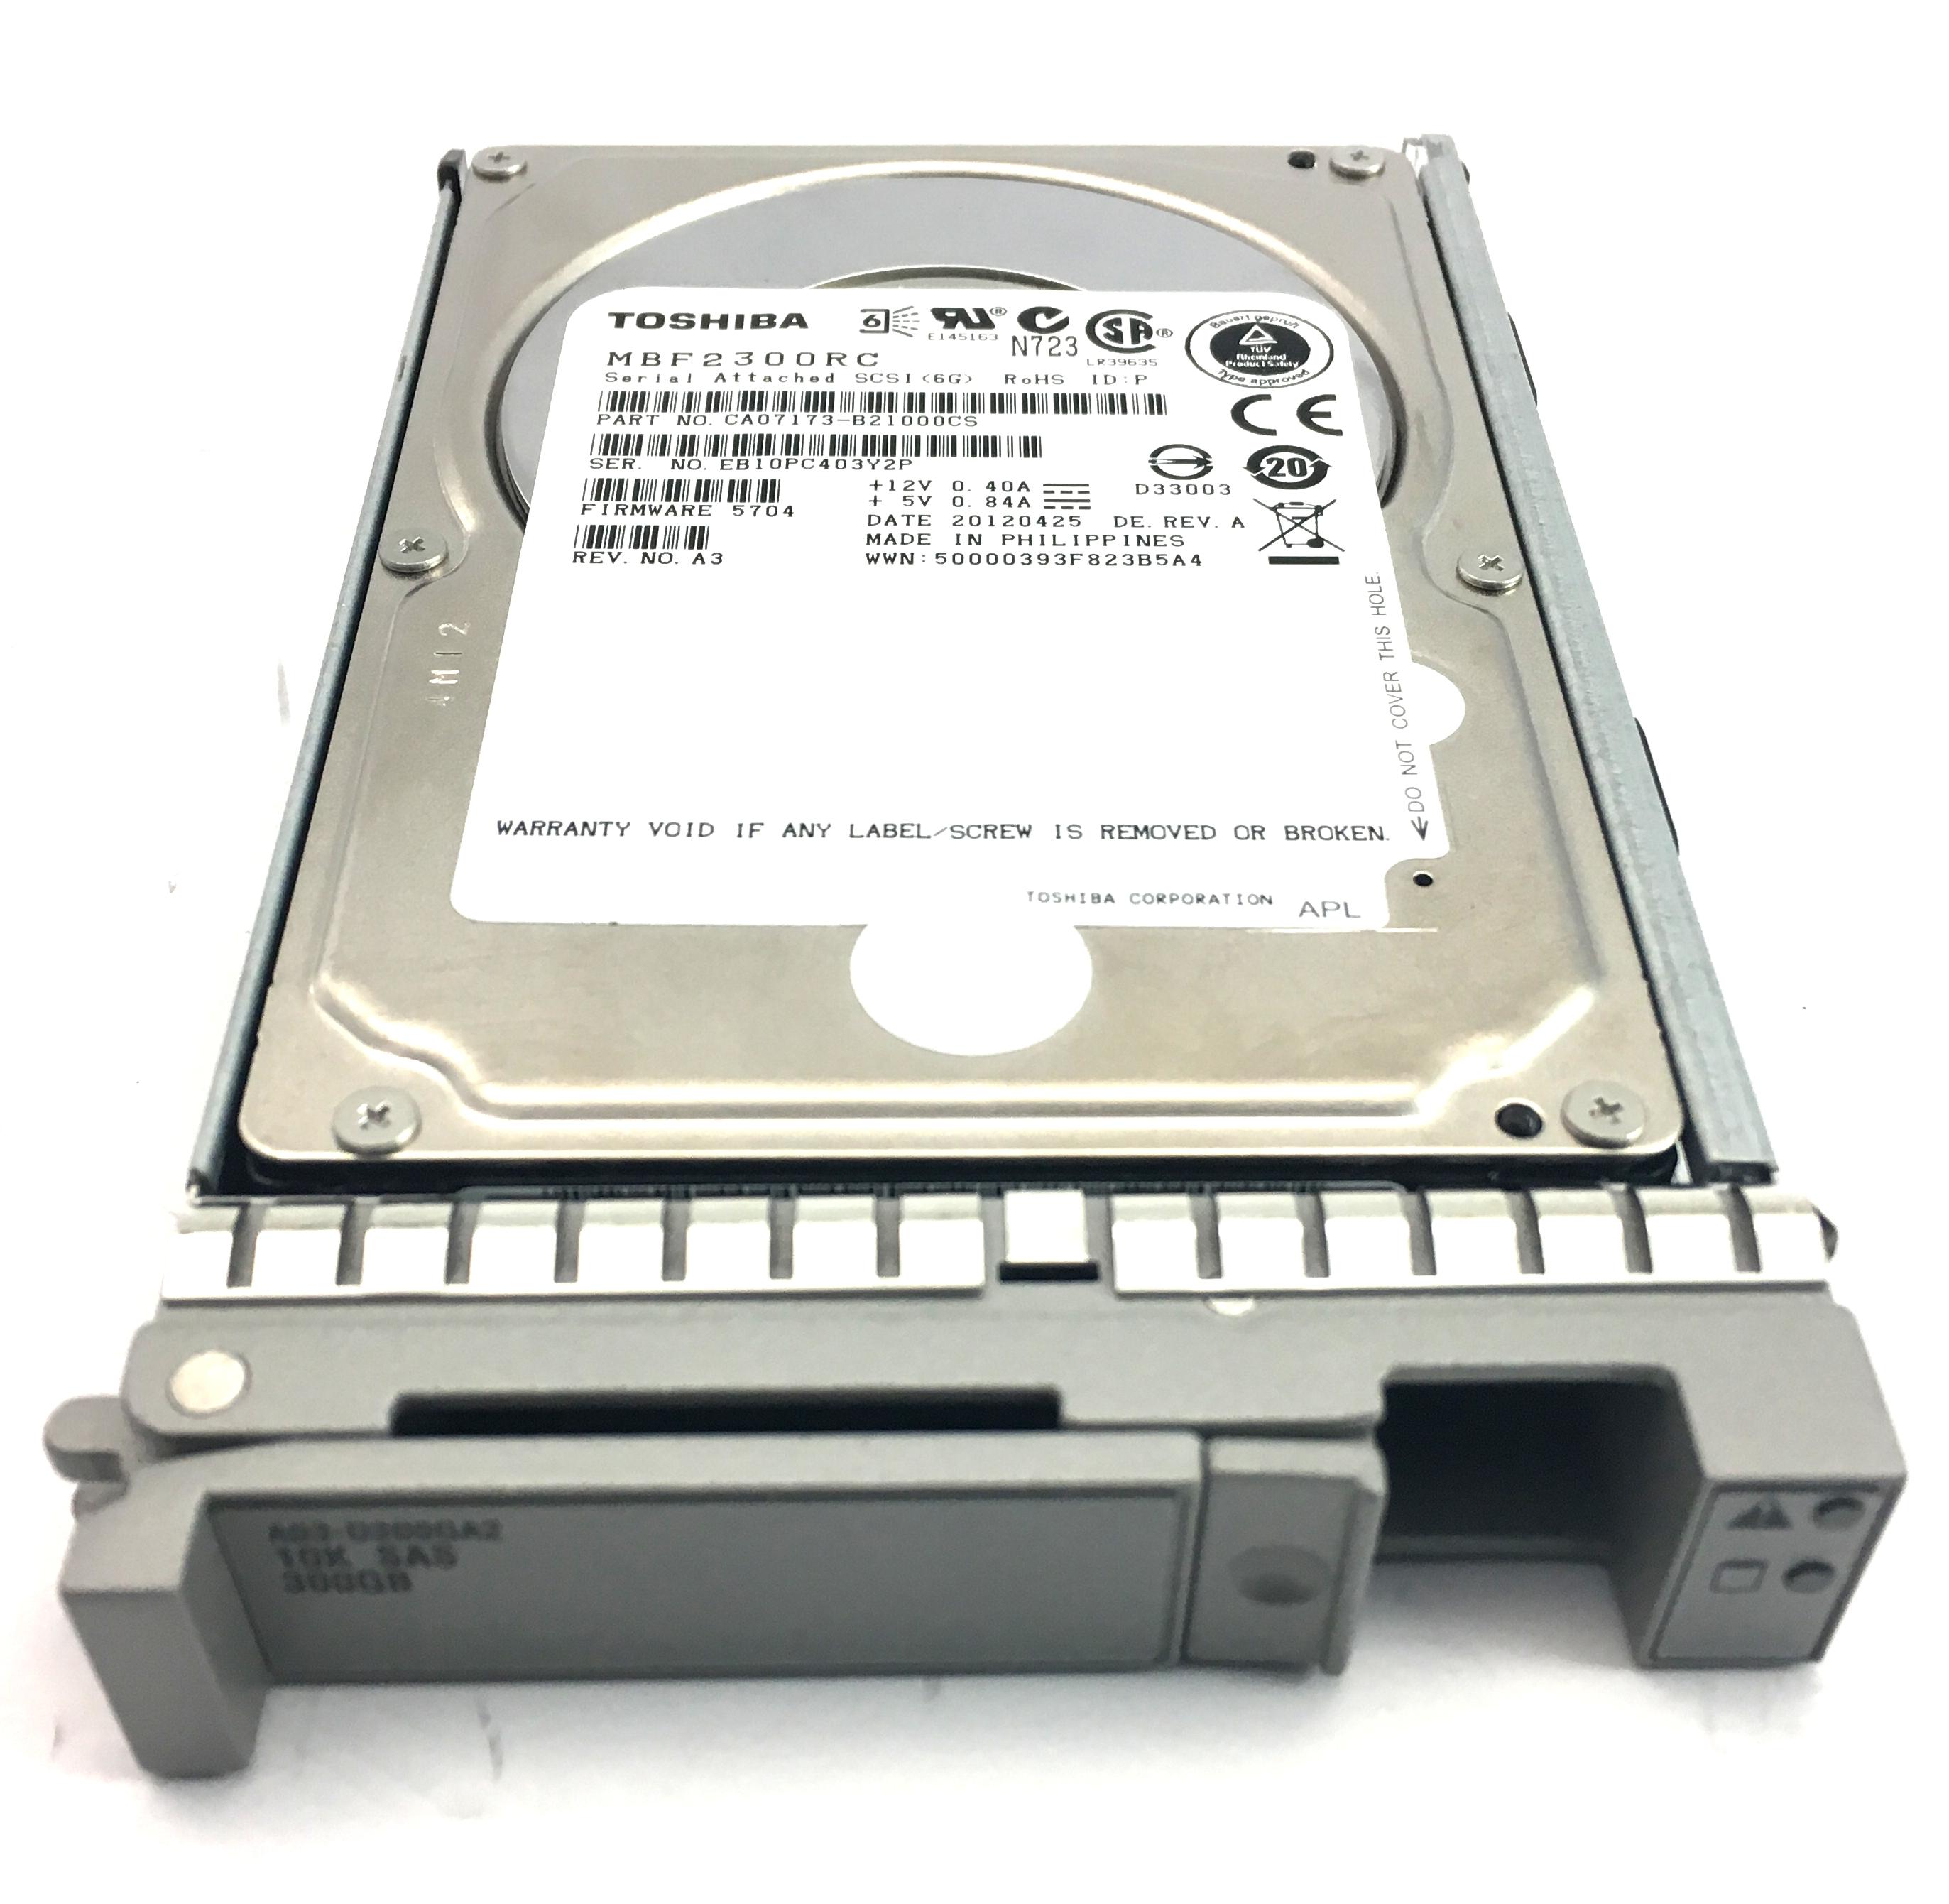 CISCO 300GB 10K 6GBPS SAS 2.5'' HARD DRIVE (A03-D300GA2)